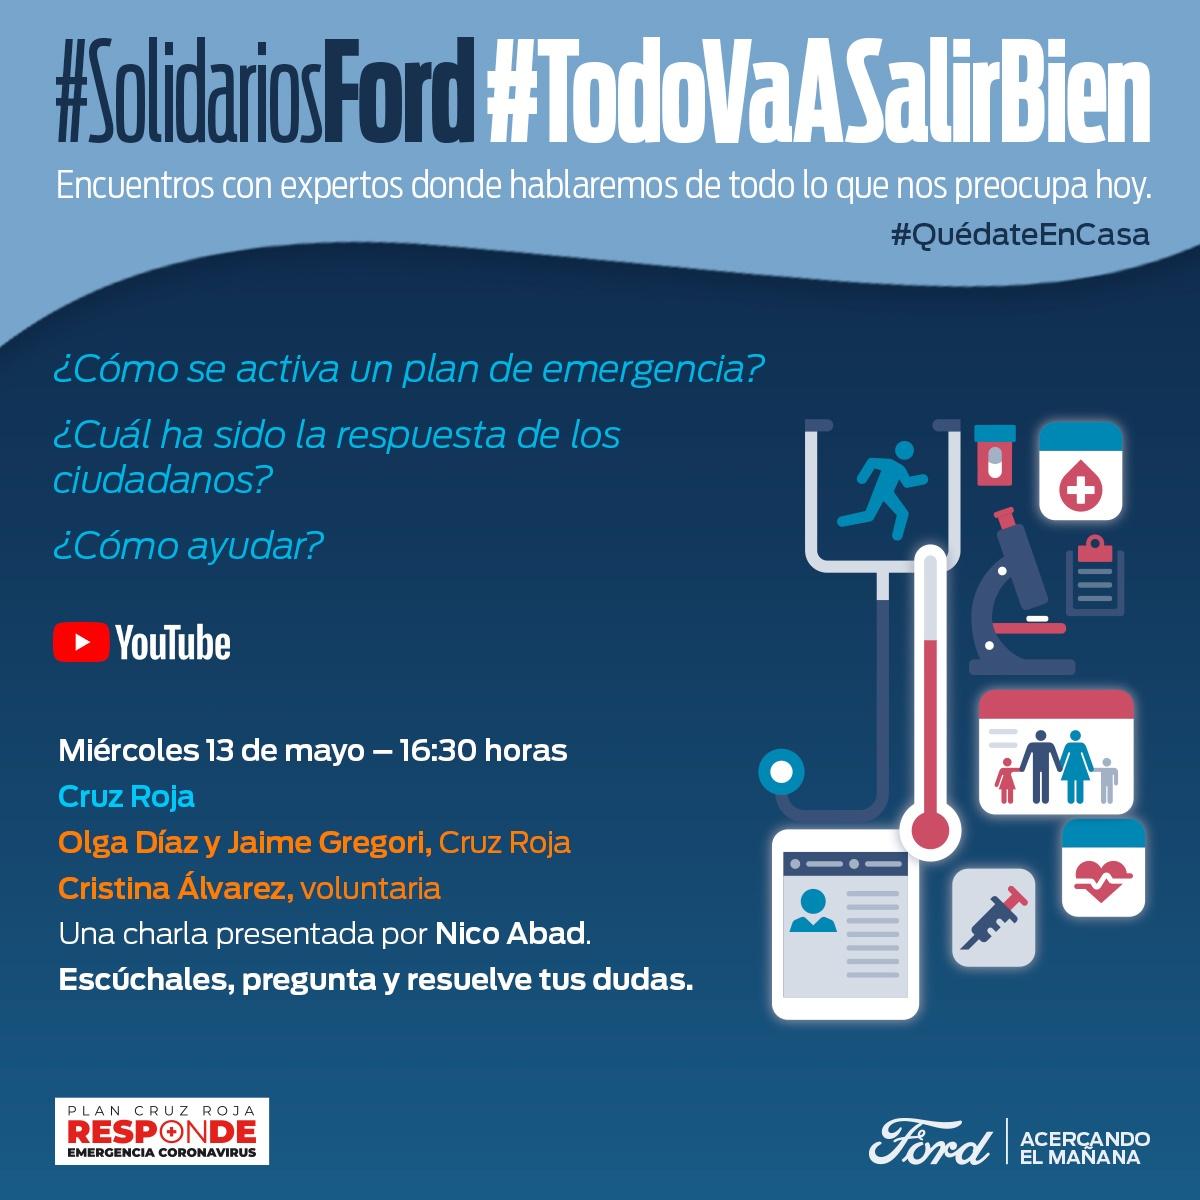 #SolidariosFord #TodoVaaSalirBien